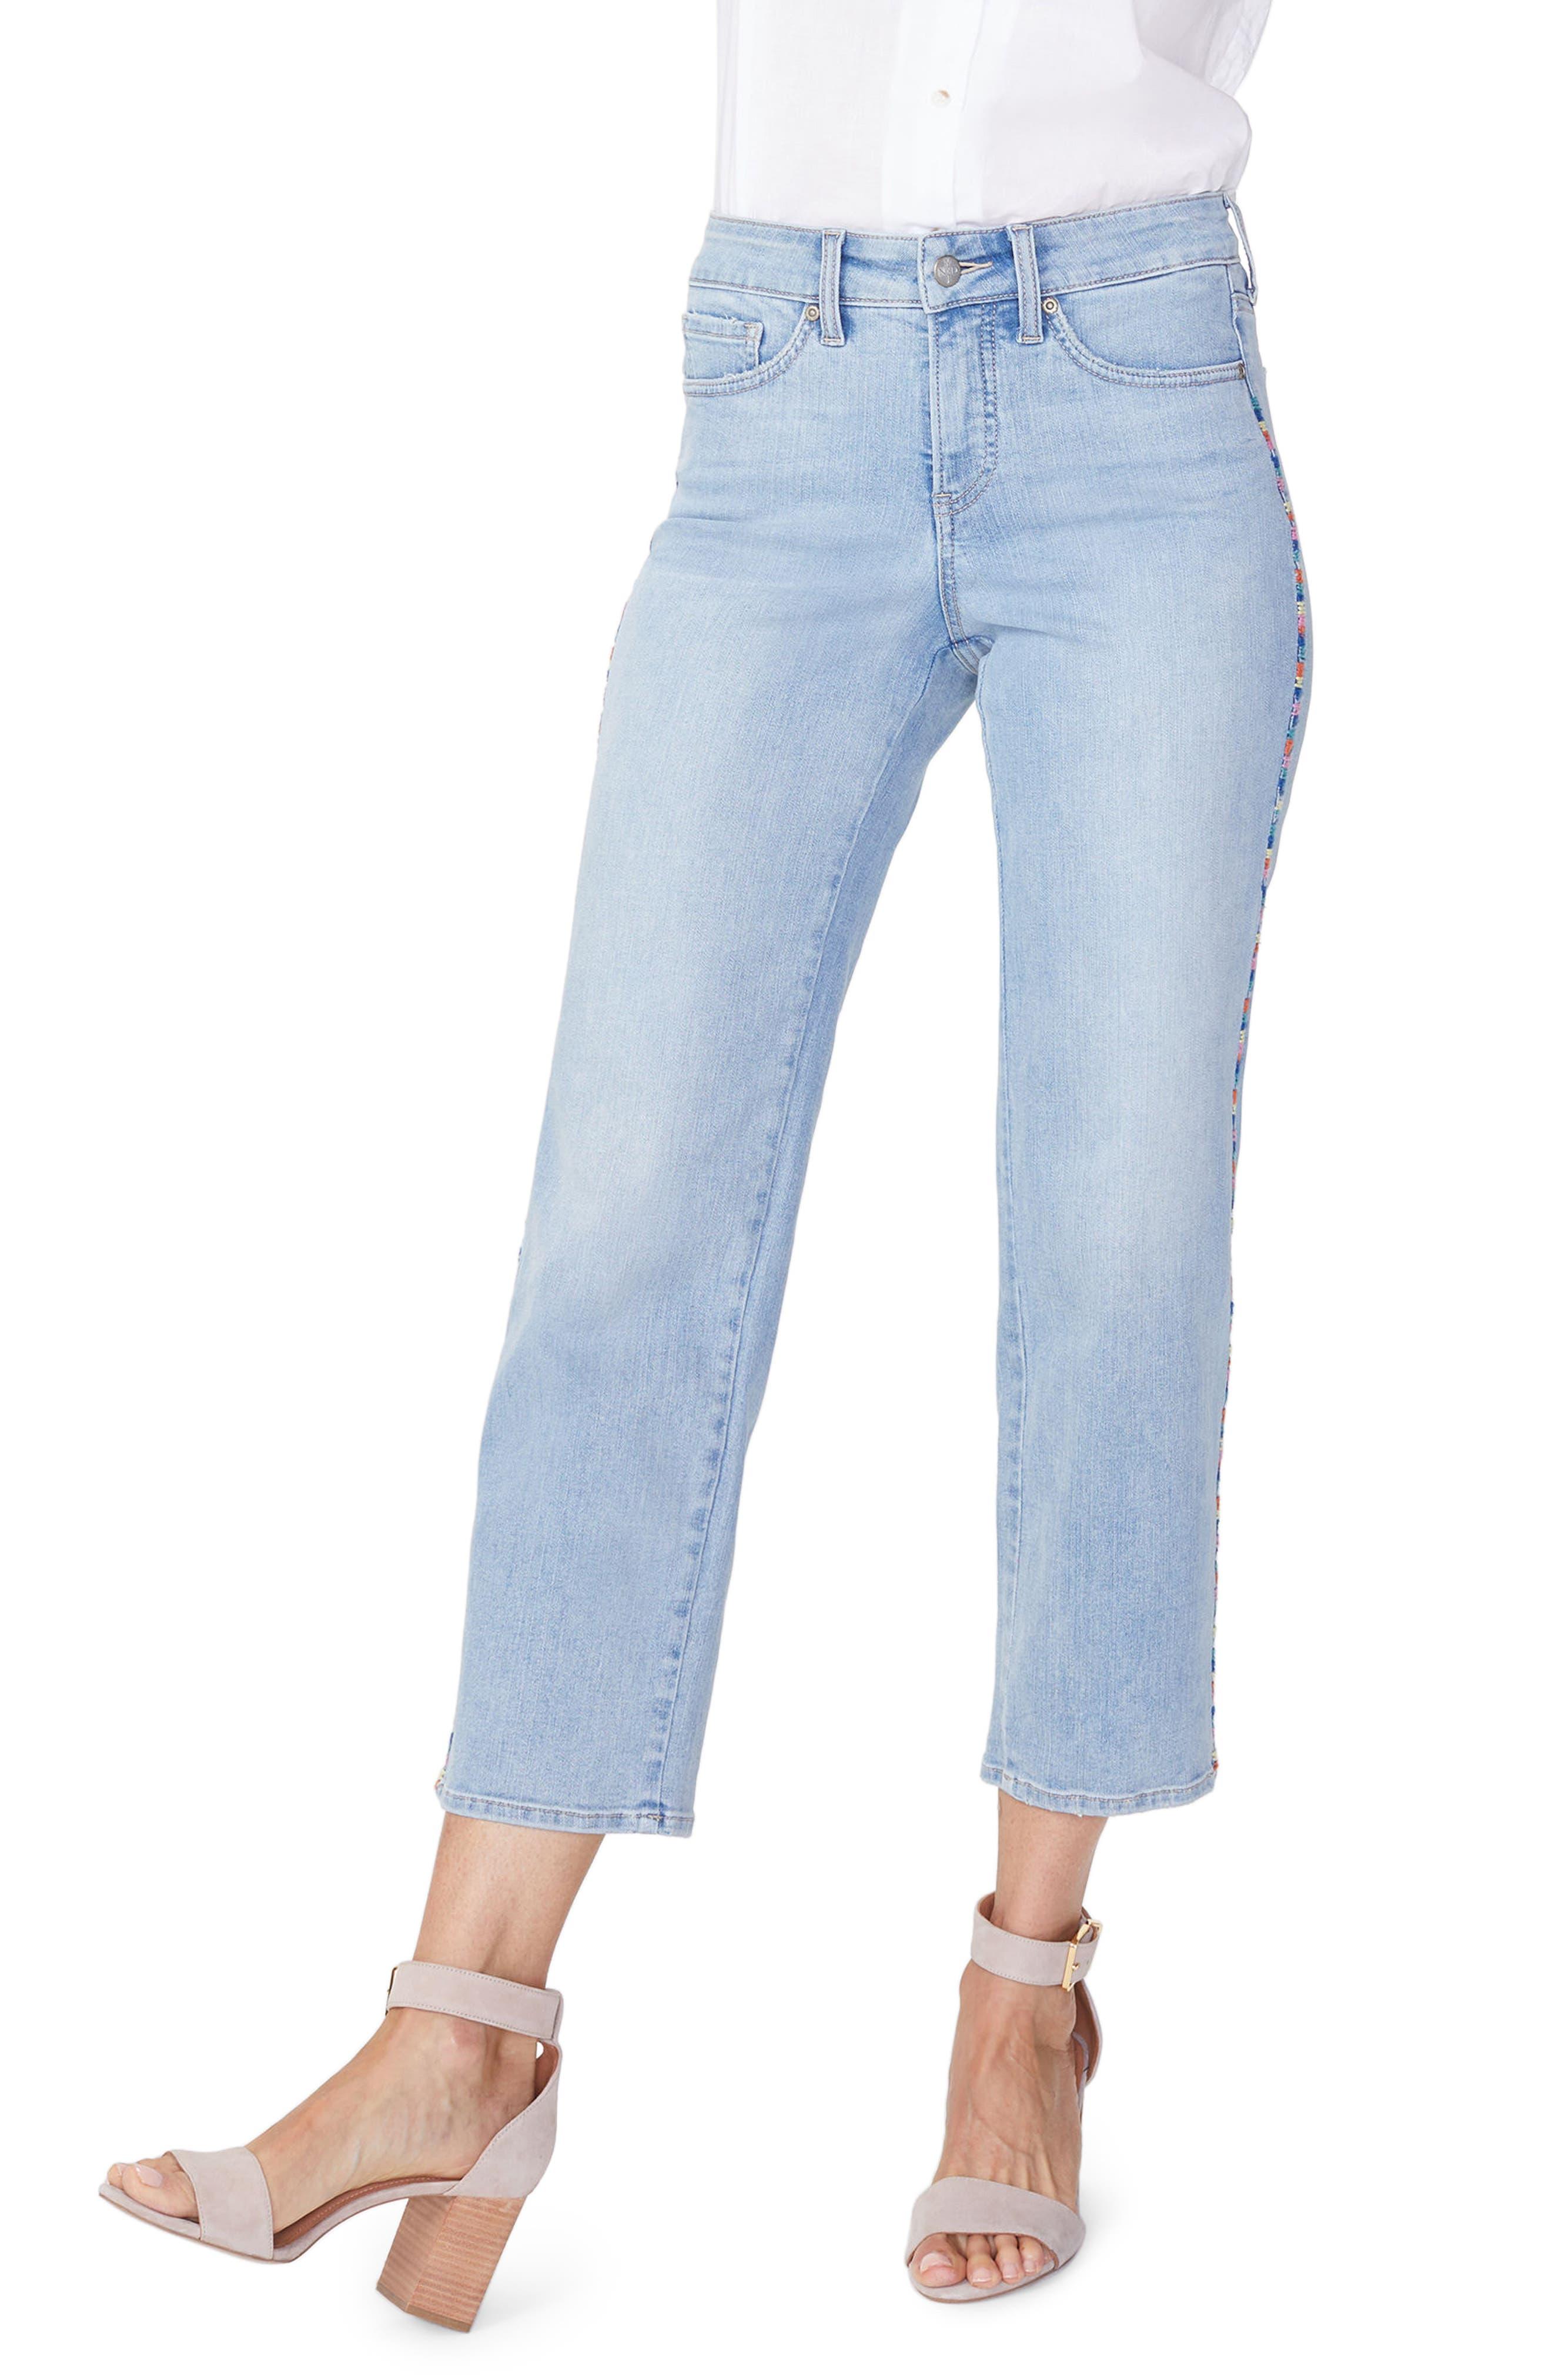 Jenna High Waist Embroidered Seam Ankle Straight Leg Jeans,                             Main thumbnail 1, color,                             Cloud Nine